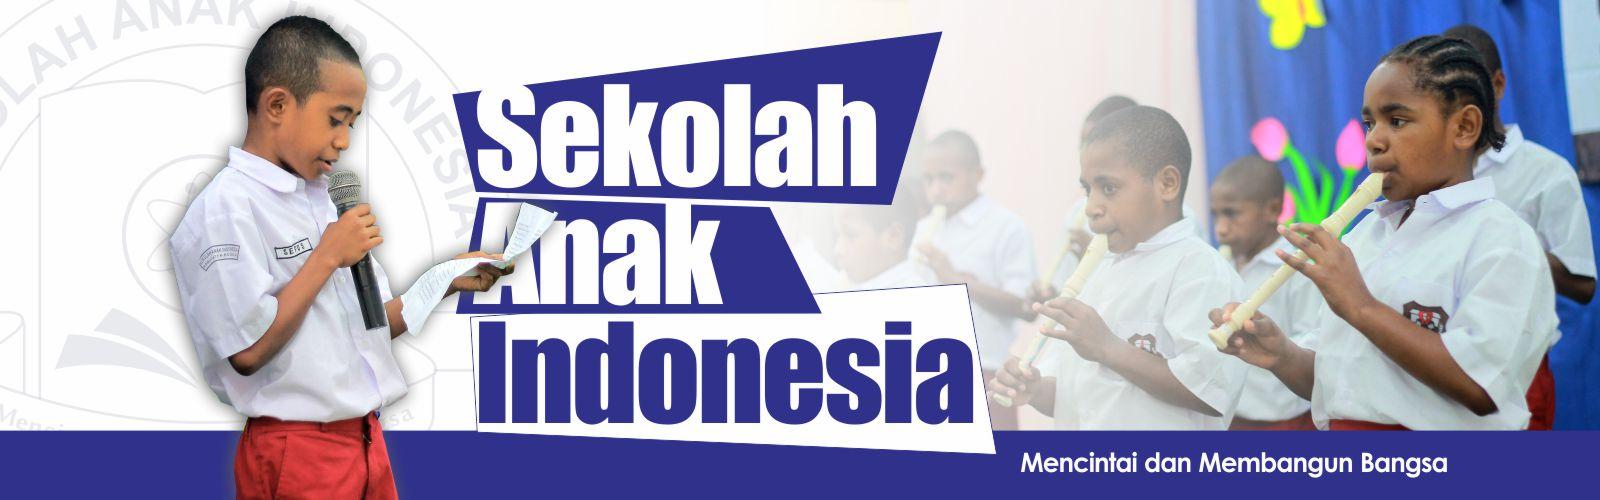 sekolah_anak_indonesia